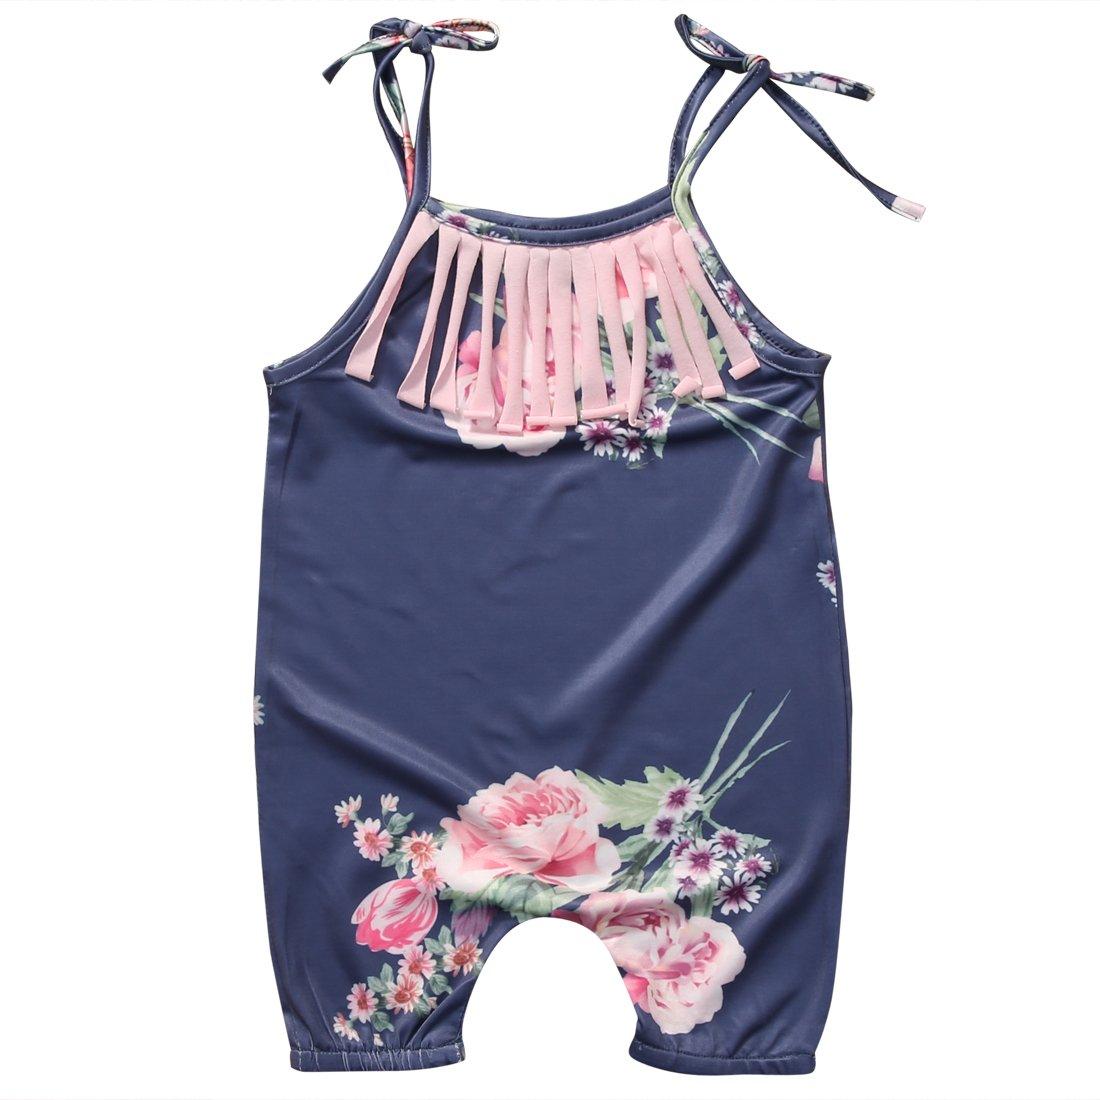 b997b9ee0983 Amazon.com  Charm Kingdom Baby Girls Halter One-Pieces Floral ...